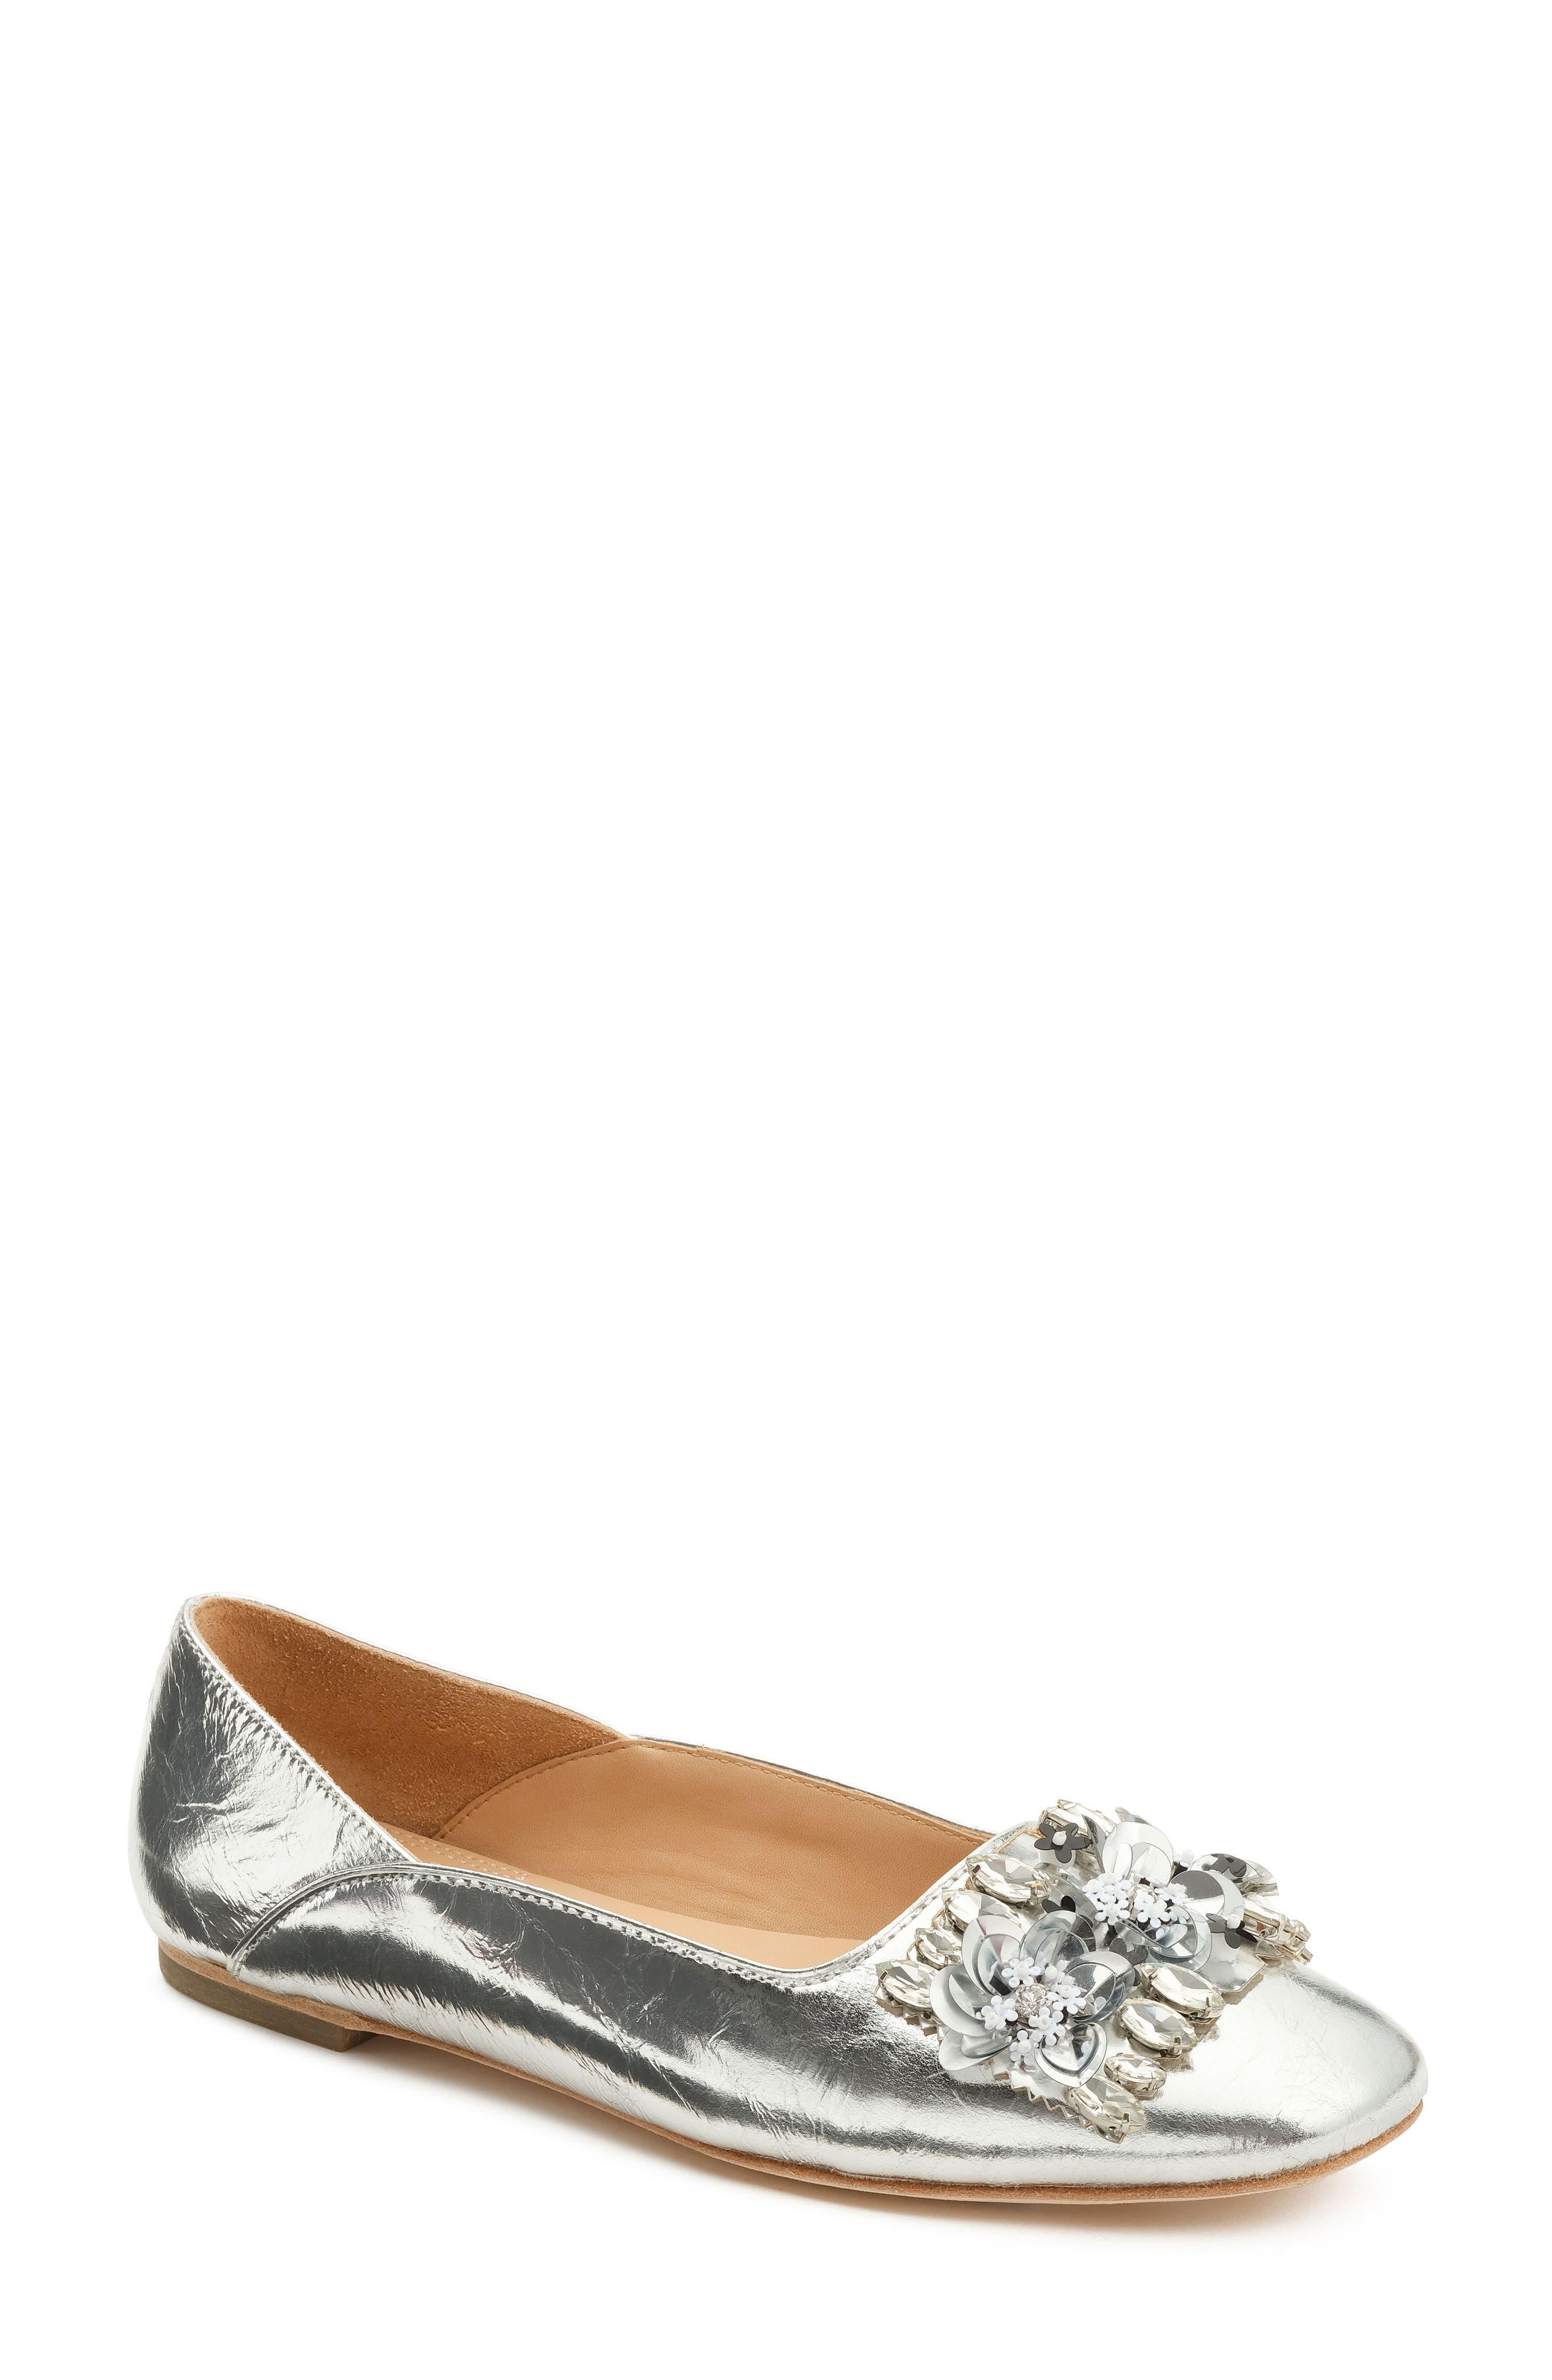 Aurey Embellished Ballet Flat,                             Main thumbnail 1, color,                             Silver Foil